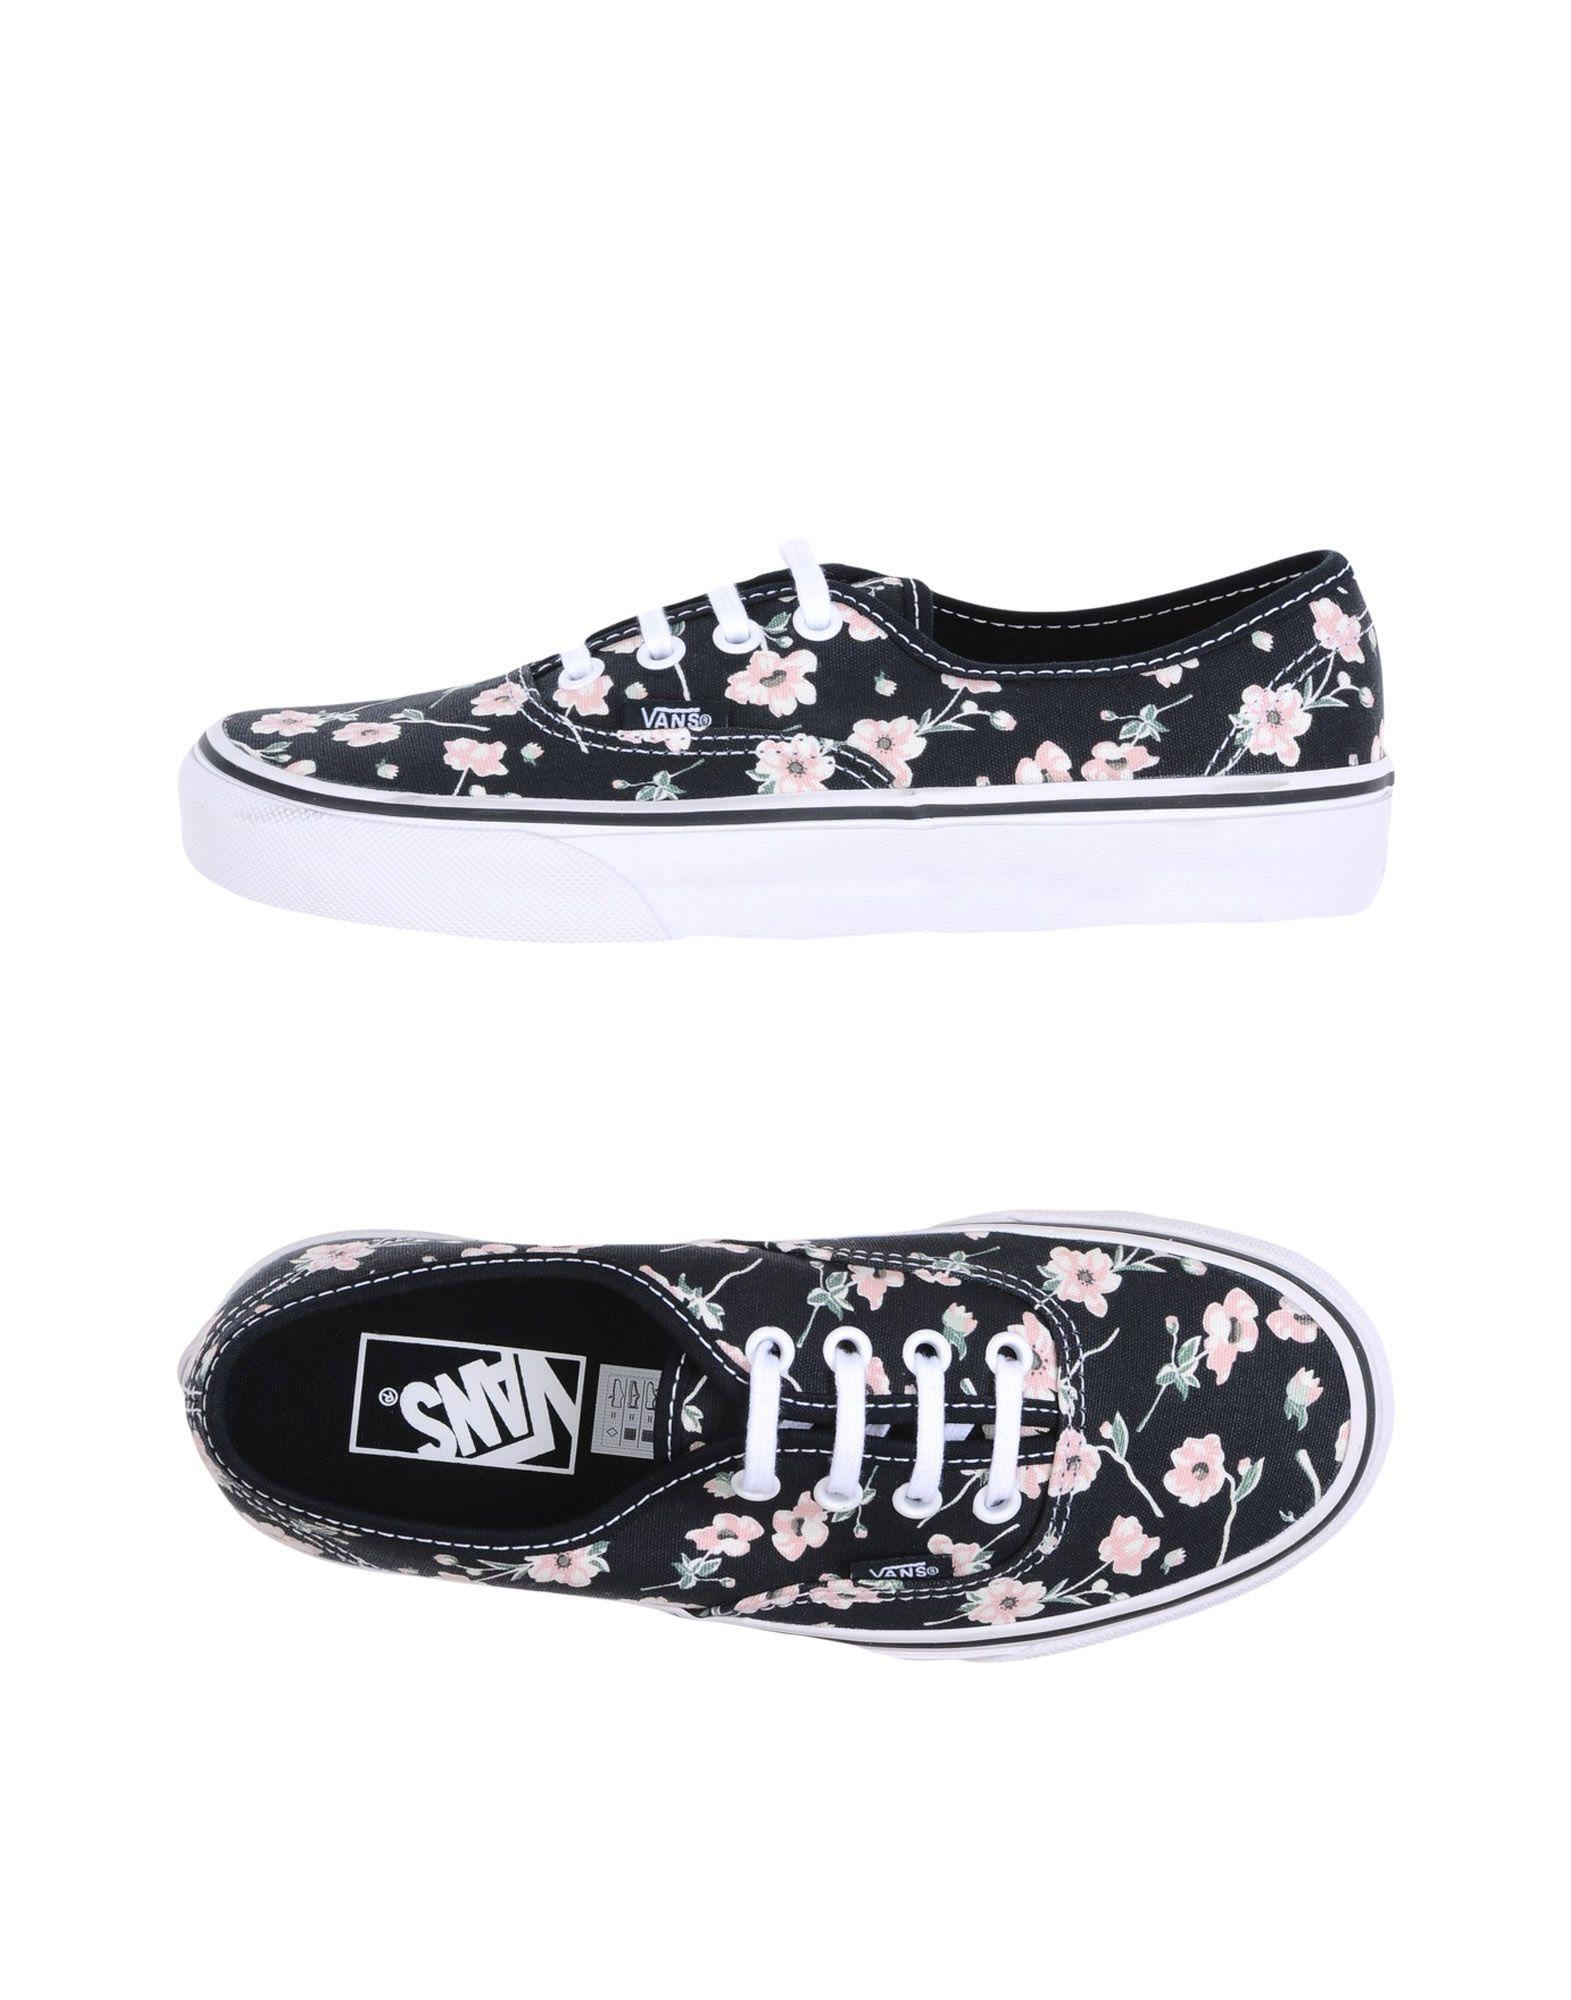 Vans Sneakers Damen  11278646QV 11278646QV   77bf21